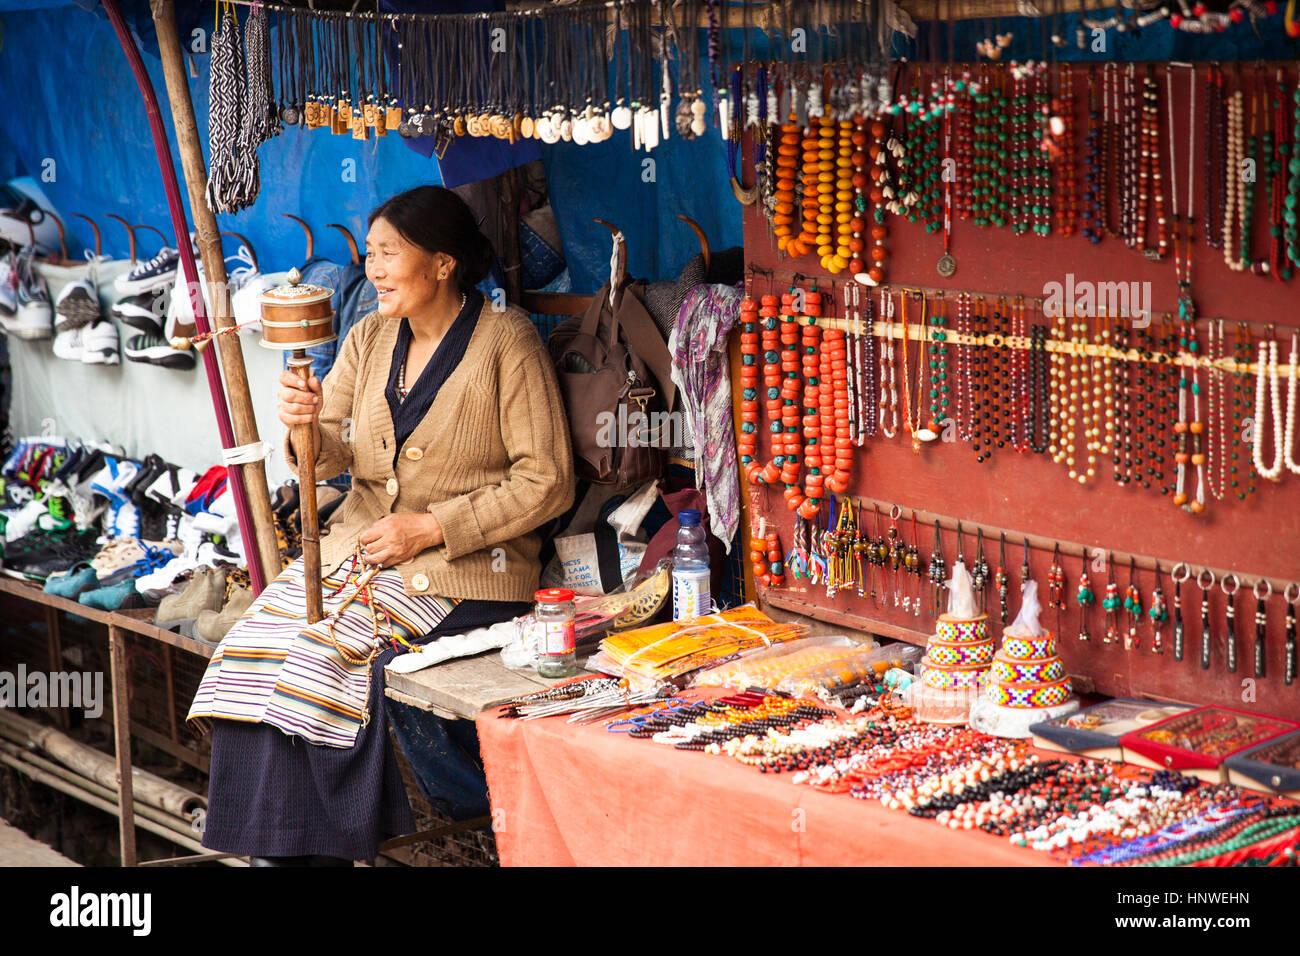 Dharamsala, India - 28 September, 2014: Tibetian woman praying with traditional hand prayer wheel at the street - Stock Image